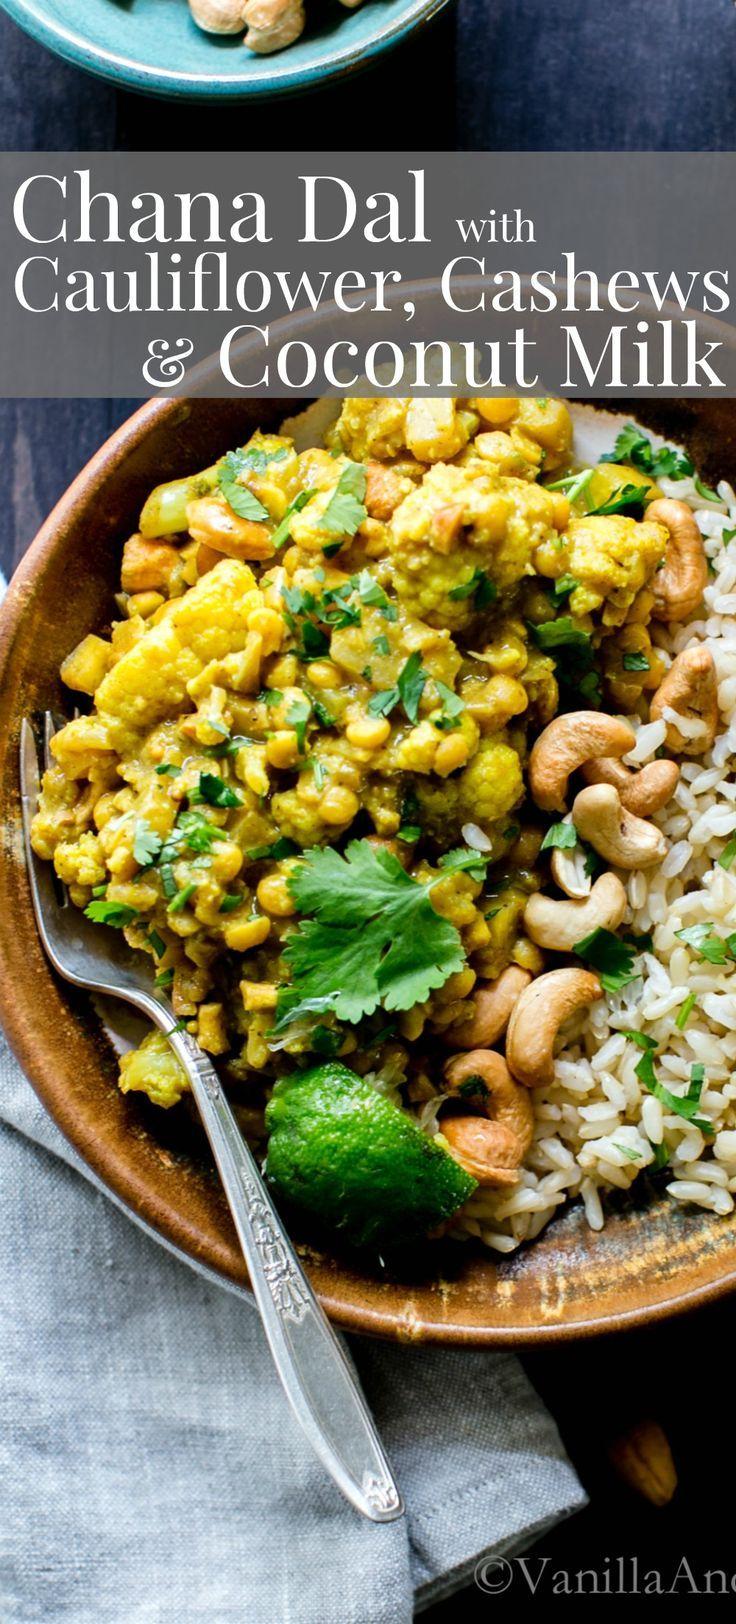 Chana Dal with Cauliflower Cashews and Coconut Mil